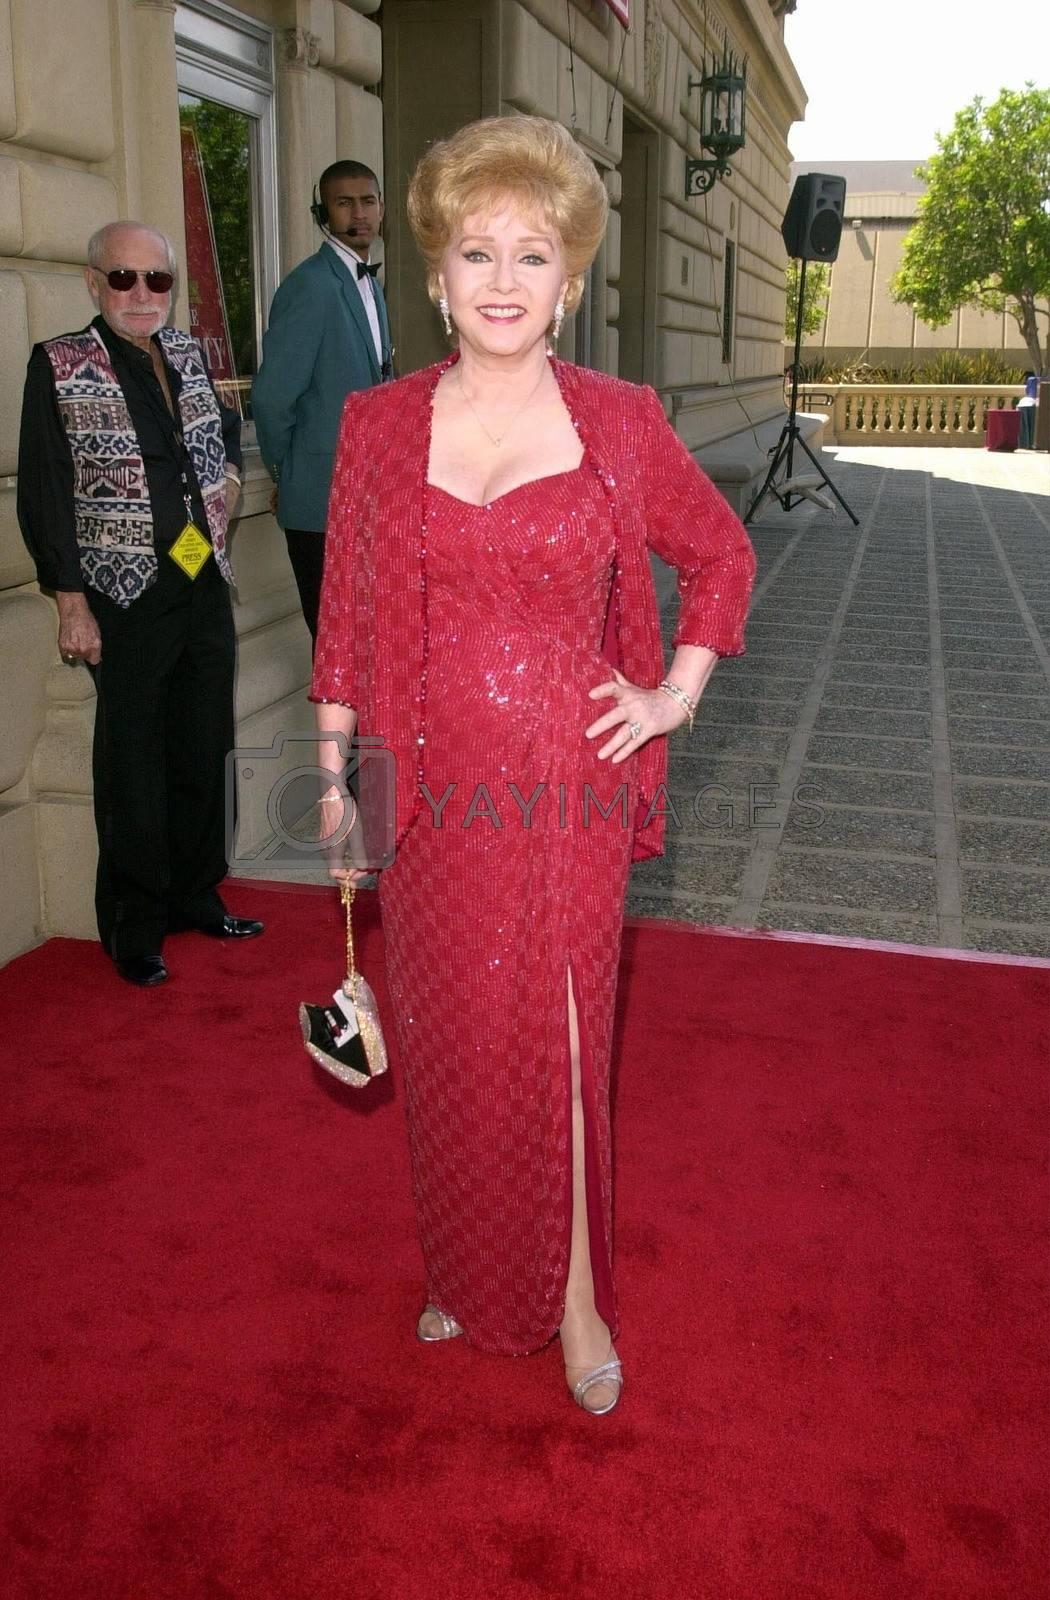 Debbie Reynolds at the Creative Arts Emmy Awards in Pasadena. 08-26-00